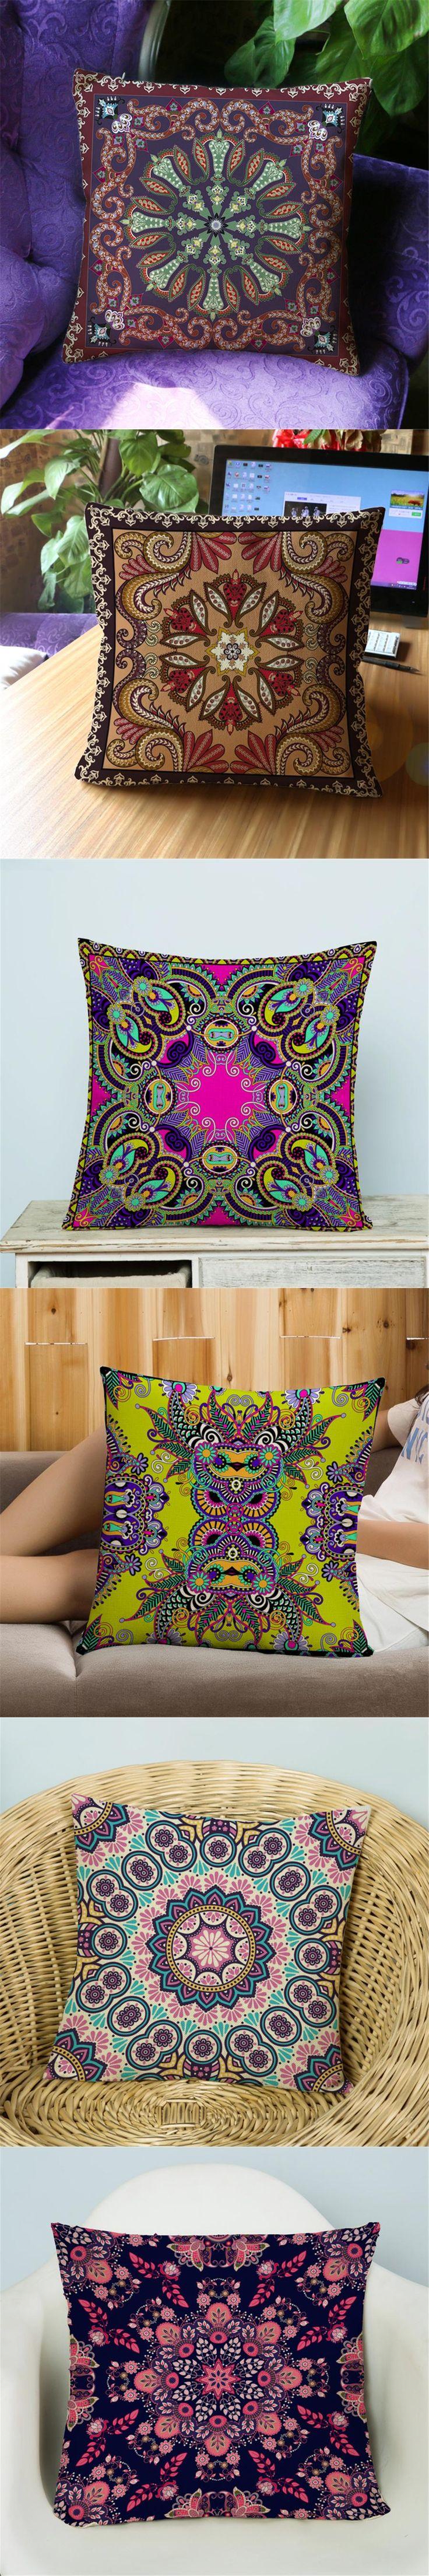 Bohemian Decoration For Home Decor Pillow Case Pouf Scandinavian Capa Almofada National Pop Art Cushion Cover For Sofa e840